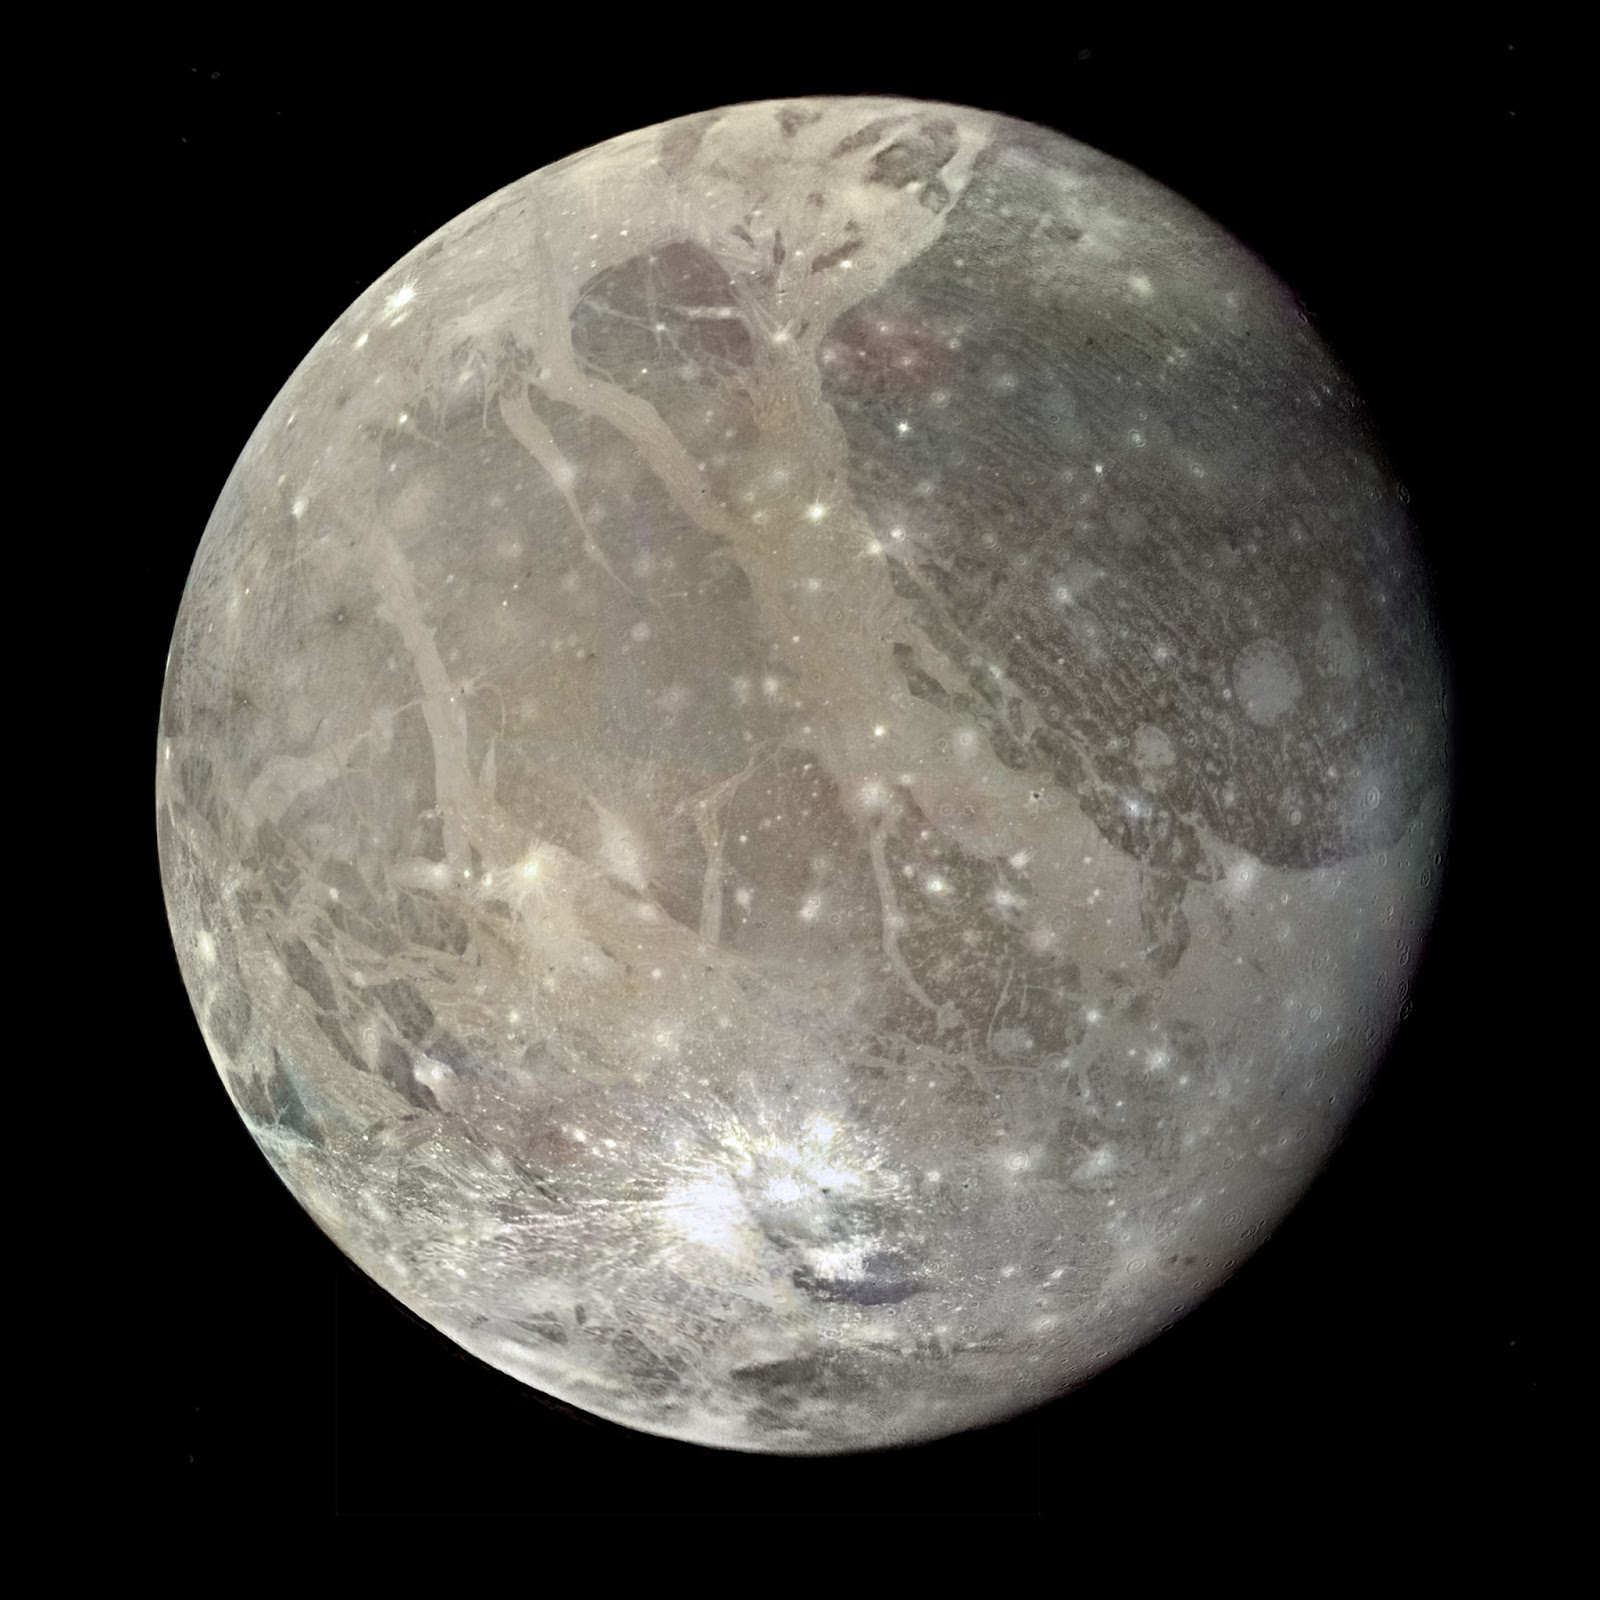 big jupiter moons - photo #46